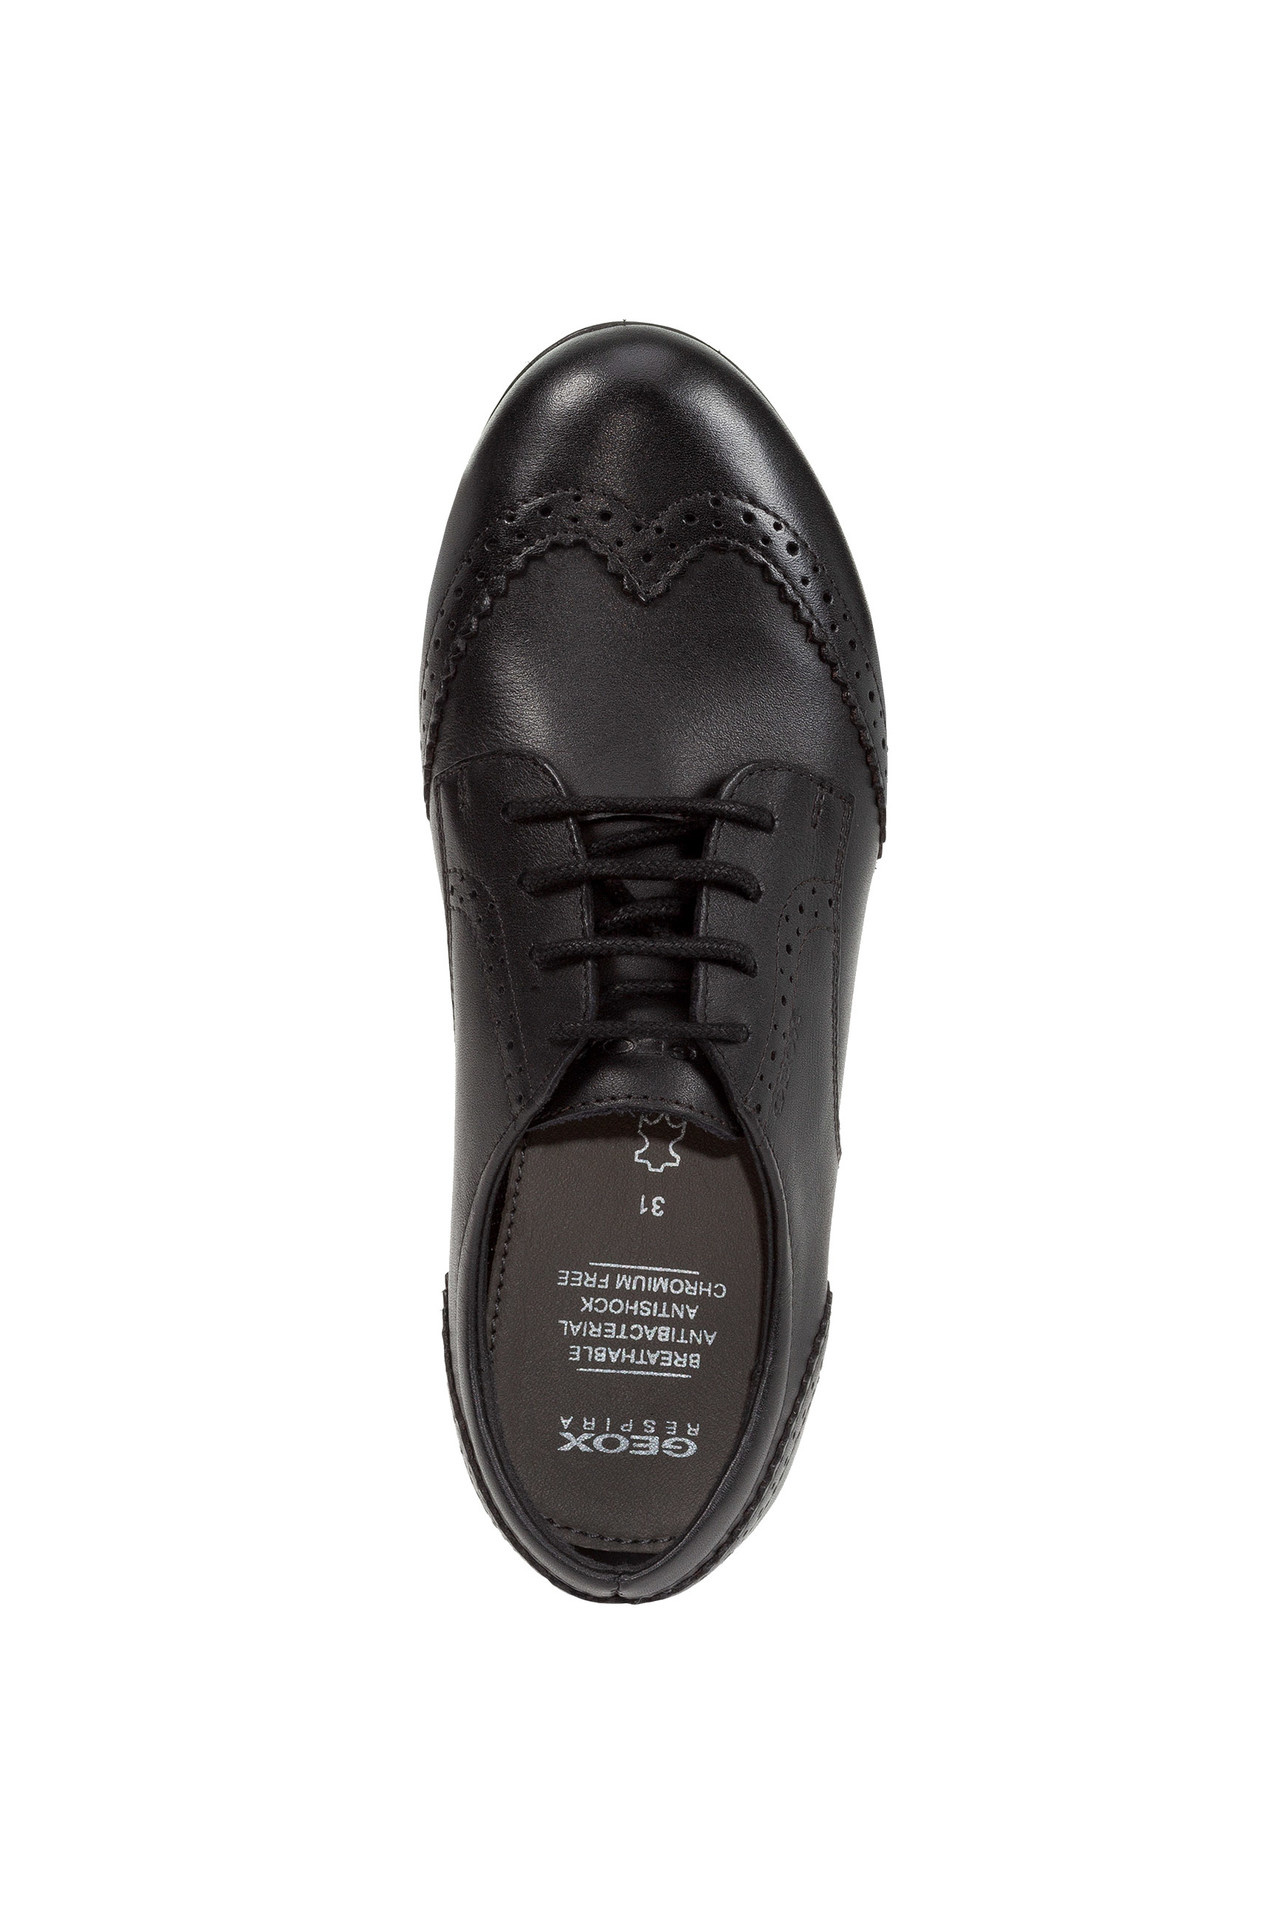 Geox Plie Lace Leather